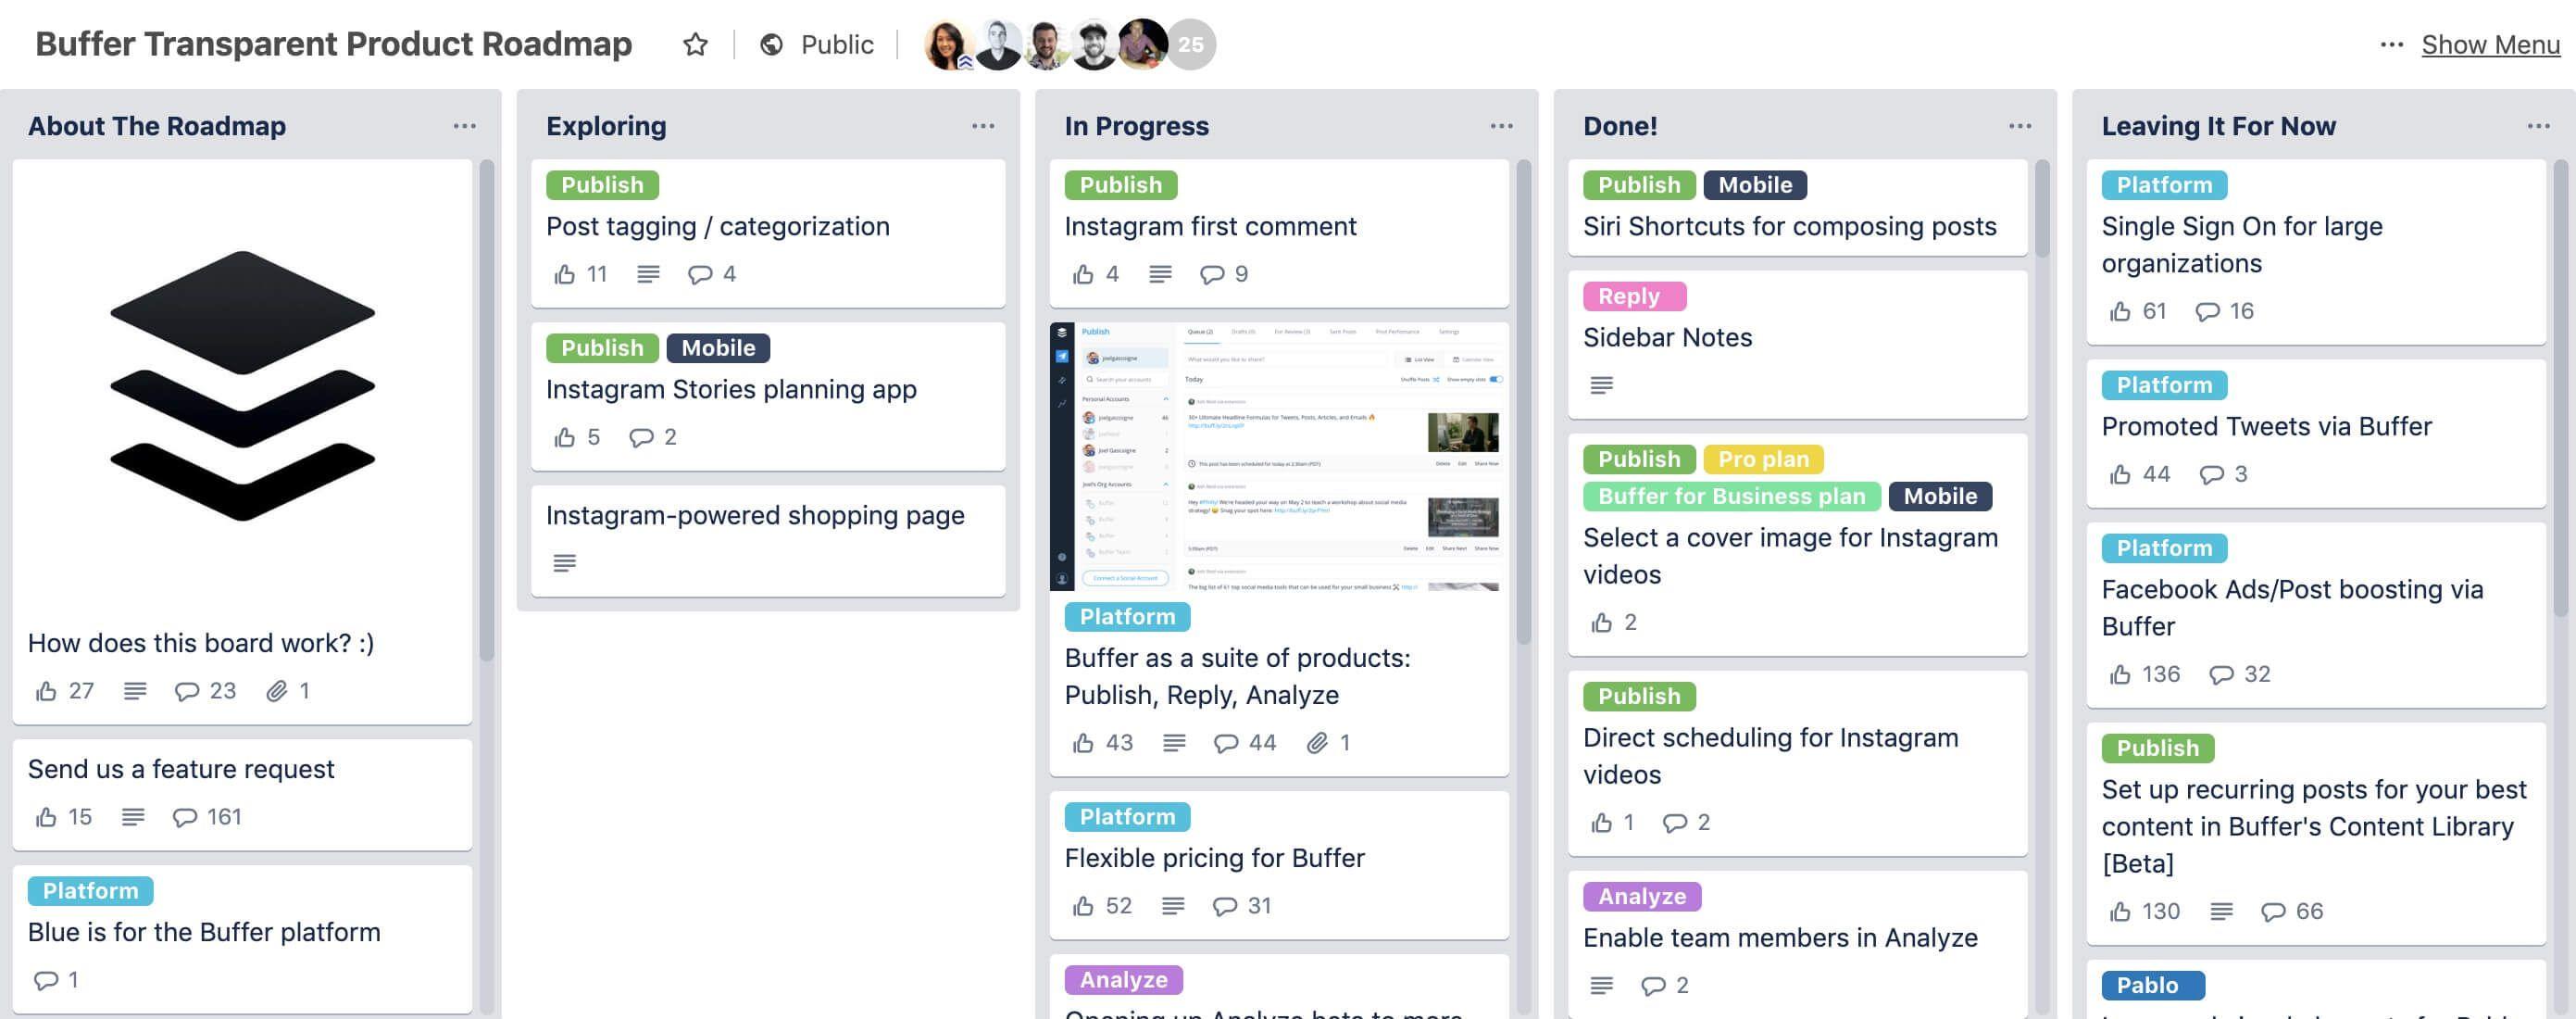 Public customer feedback programs